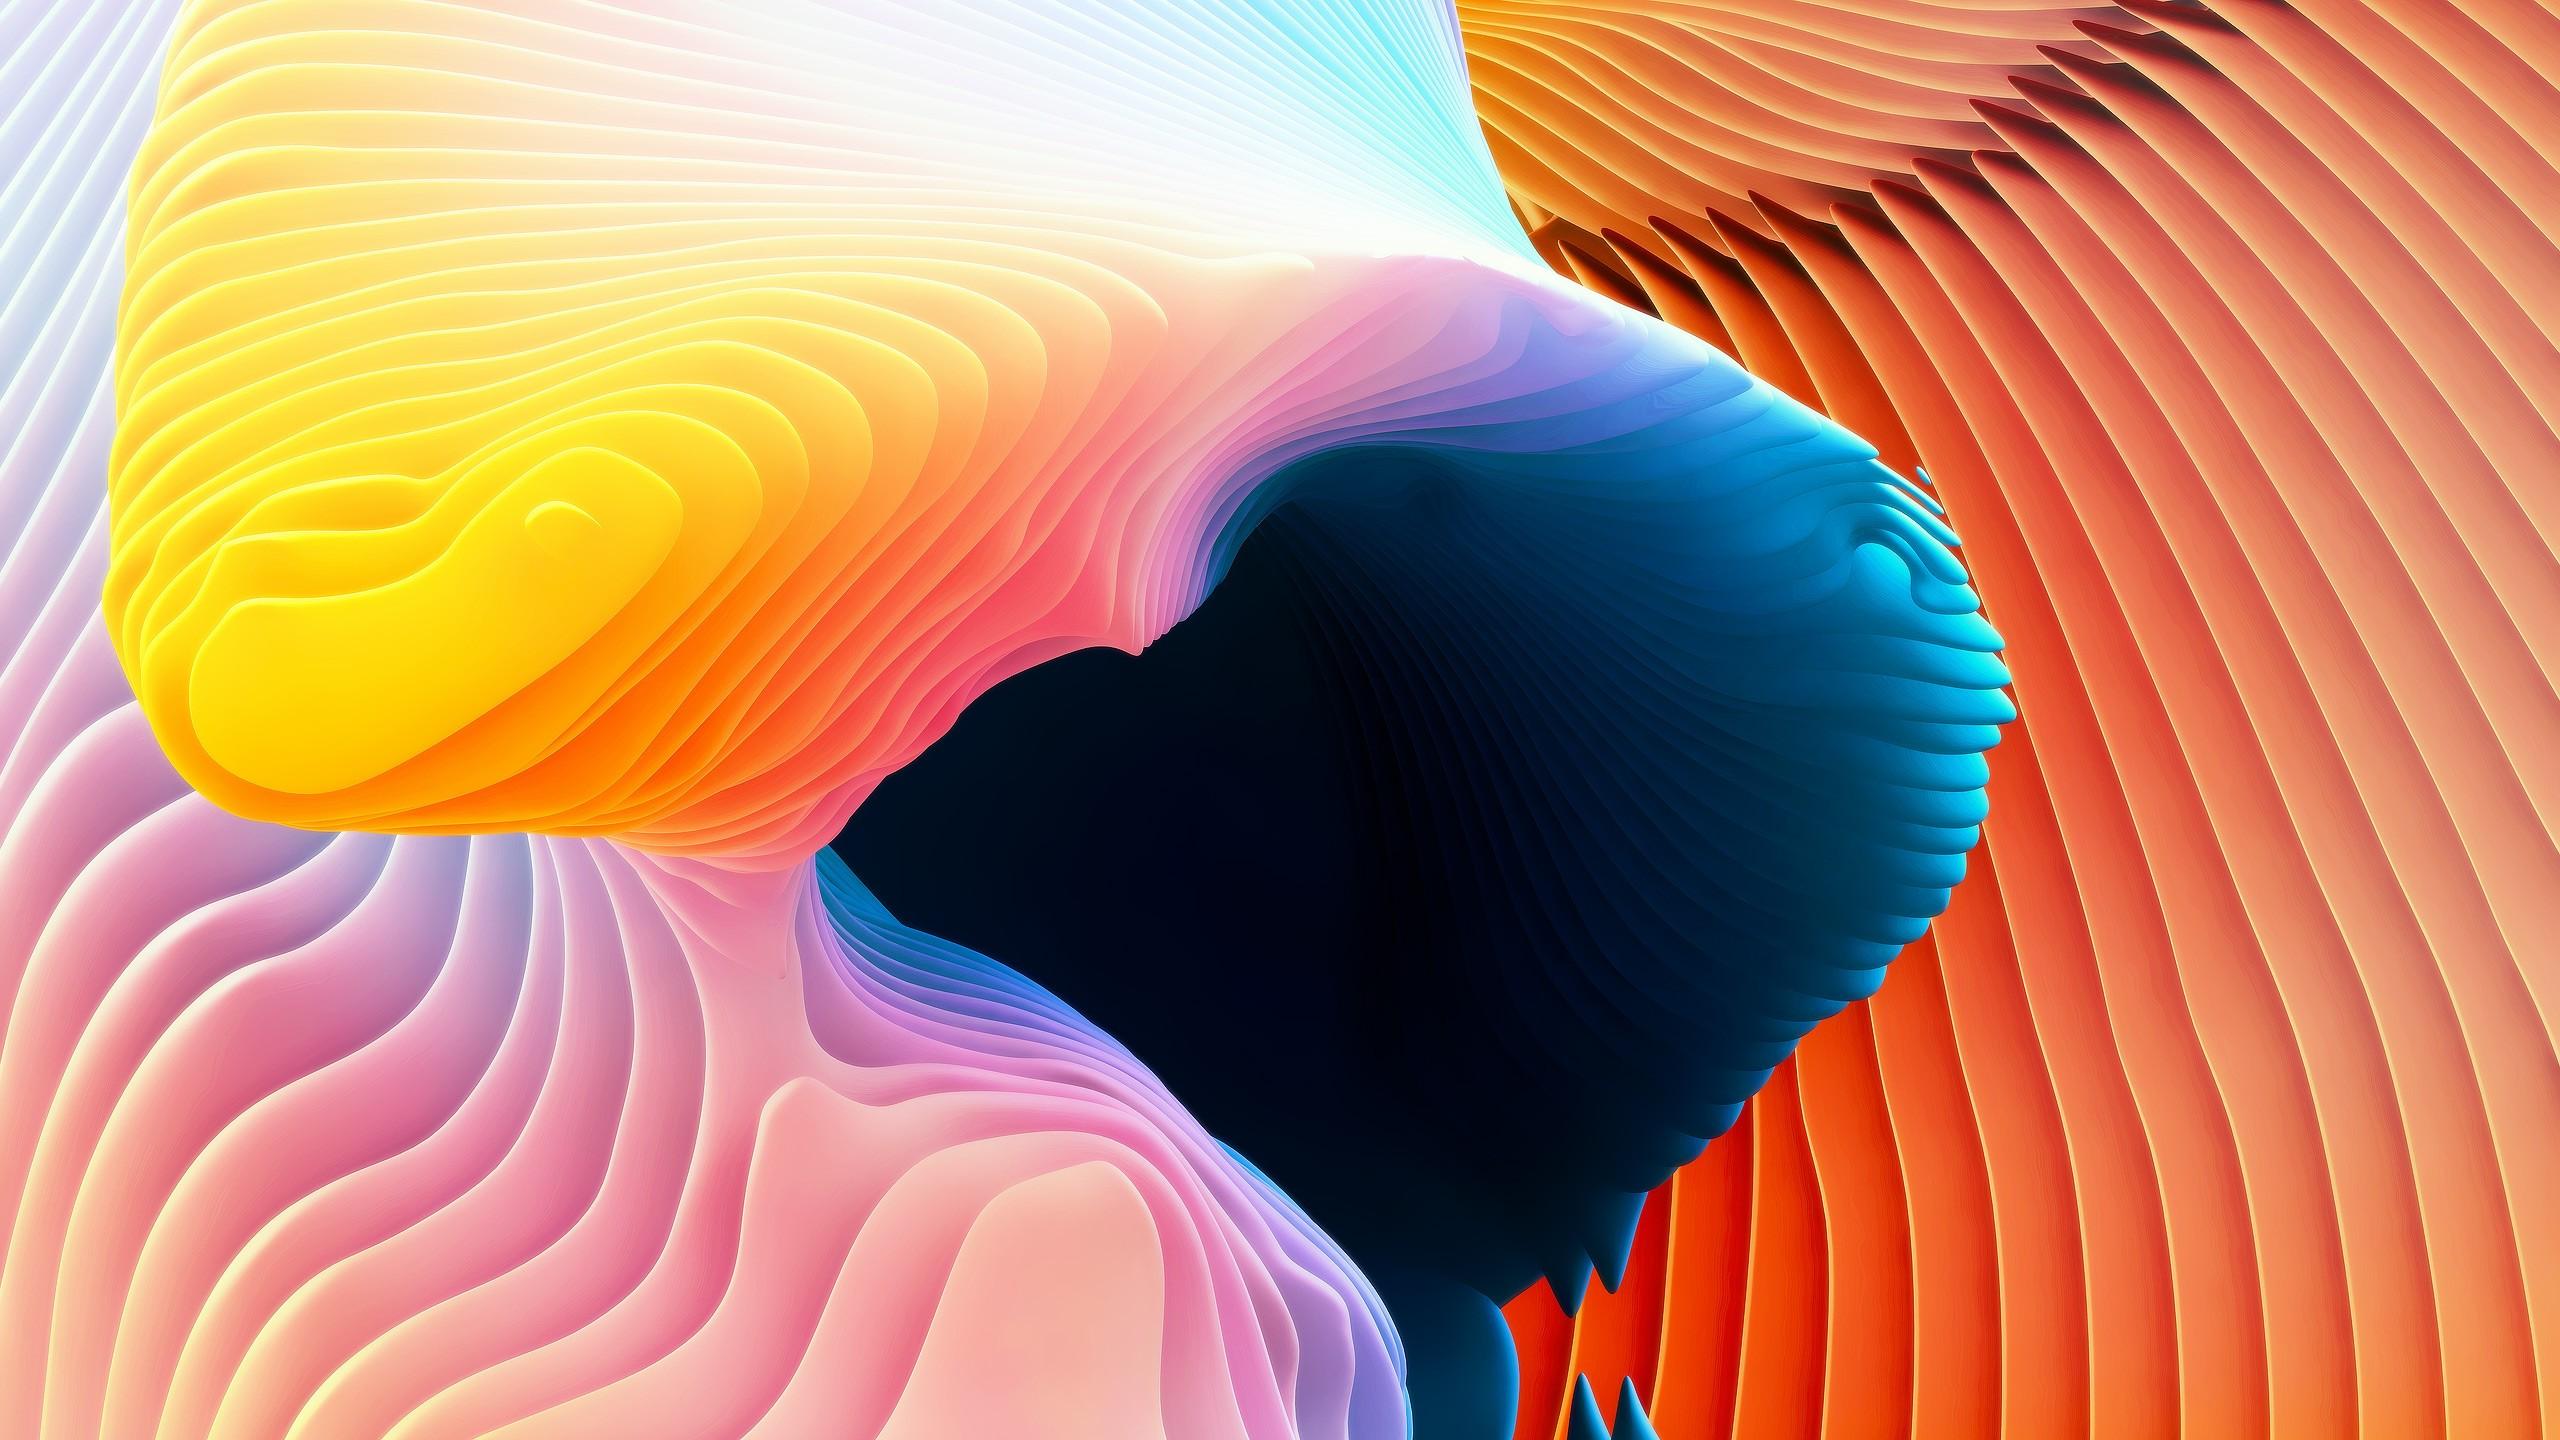 Macbook pro event wallpaper abstract macbook pro event for Wallpaper 2016 home